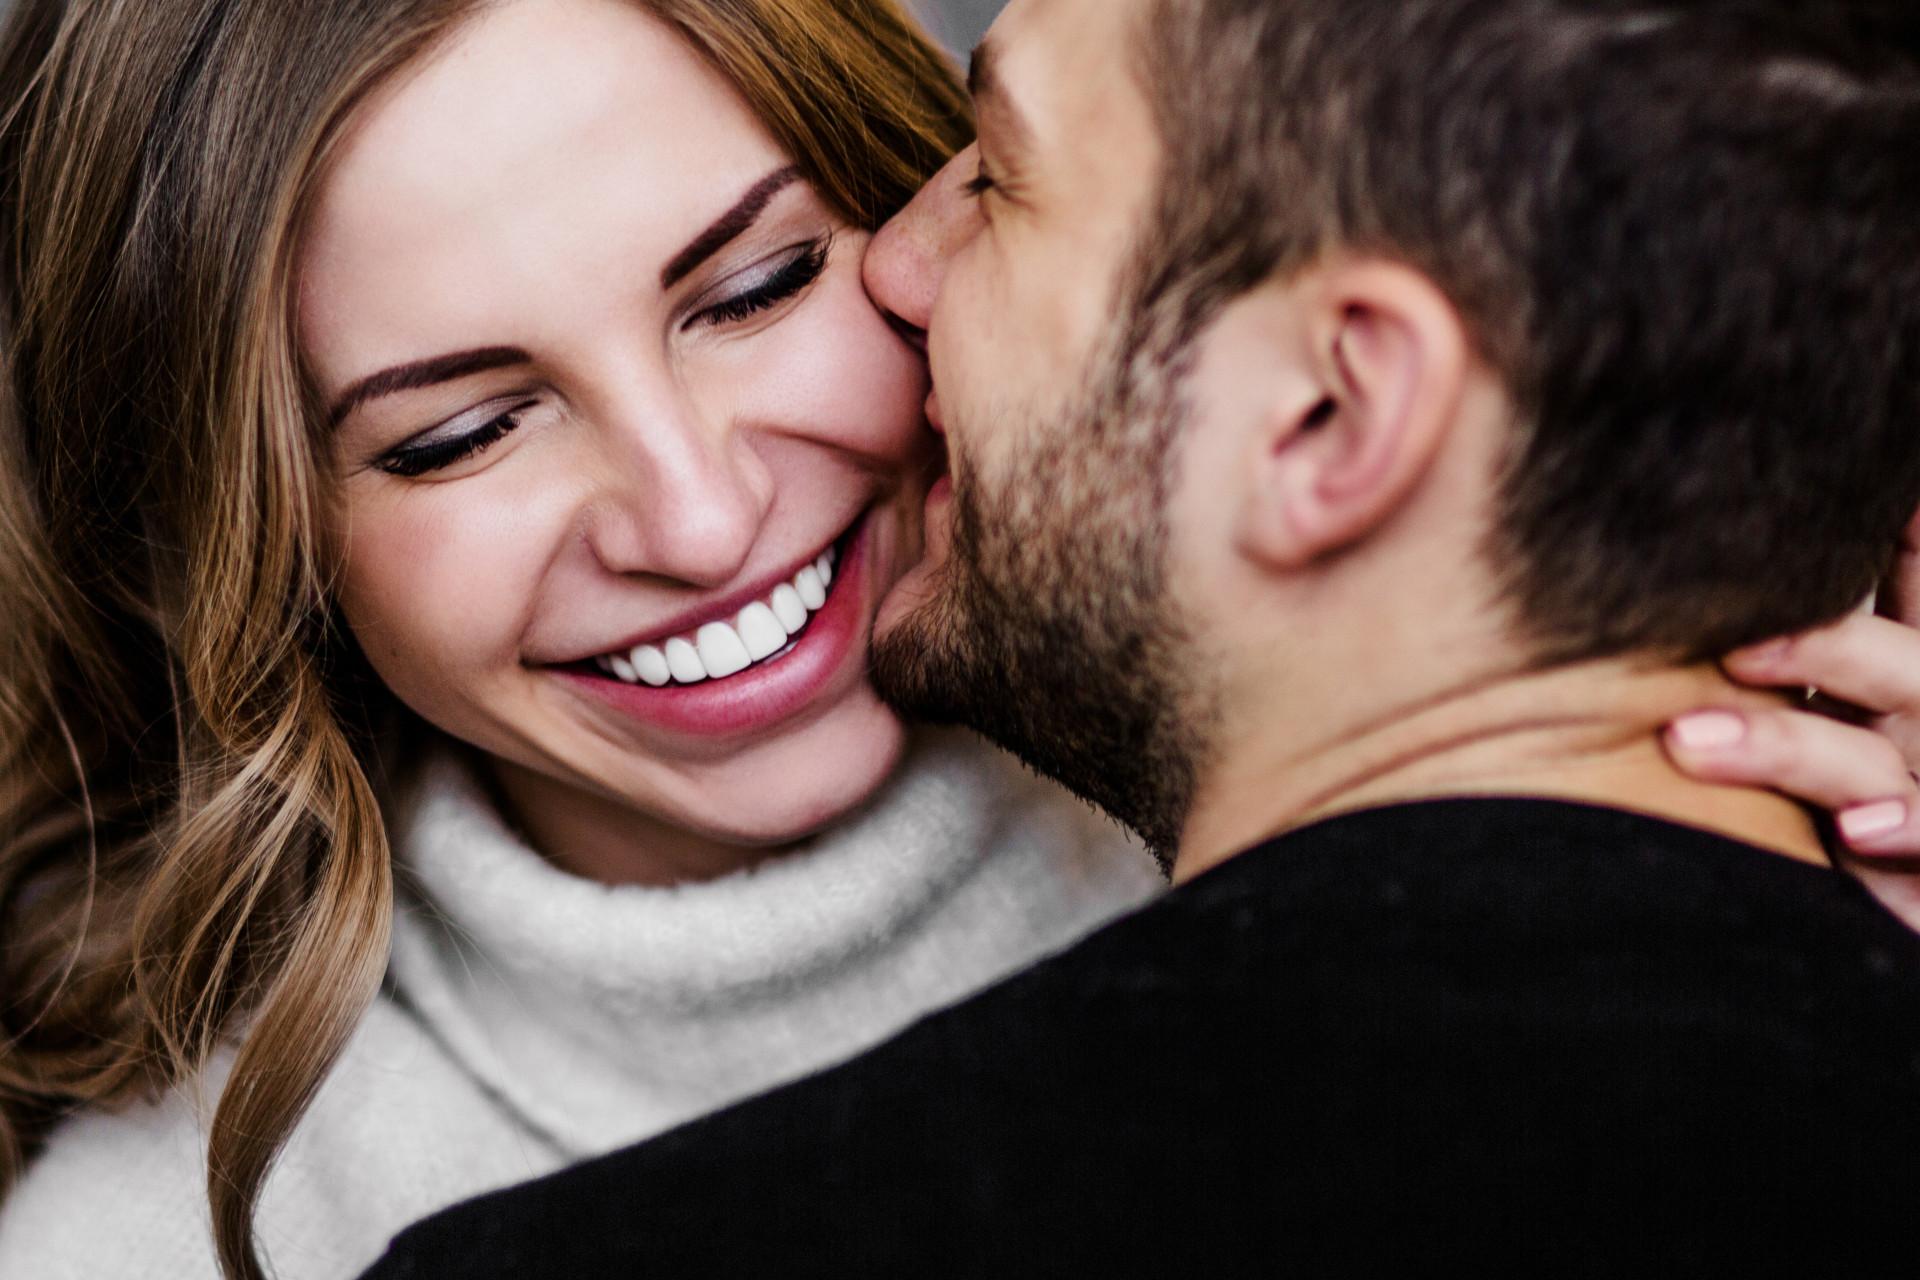 eko älskare dating